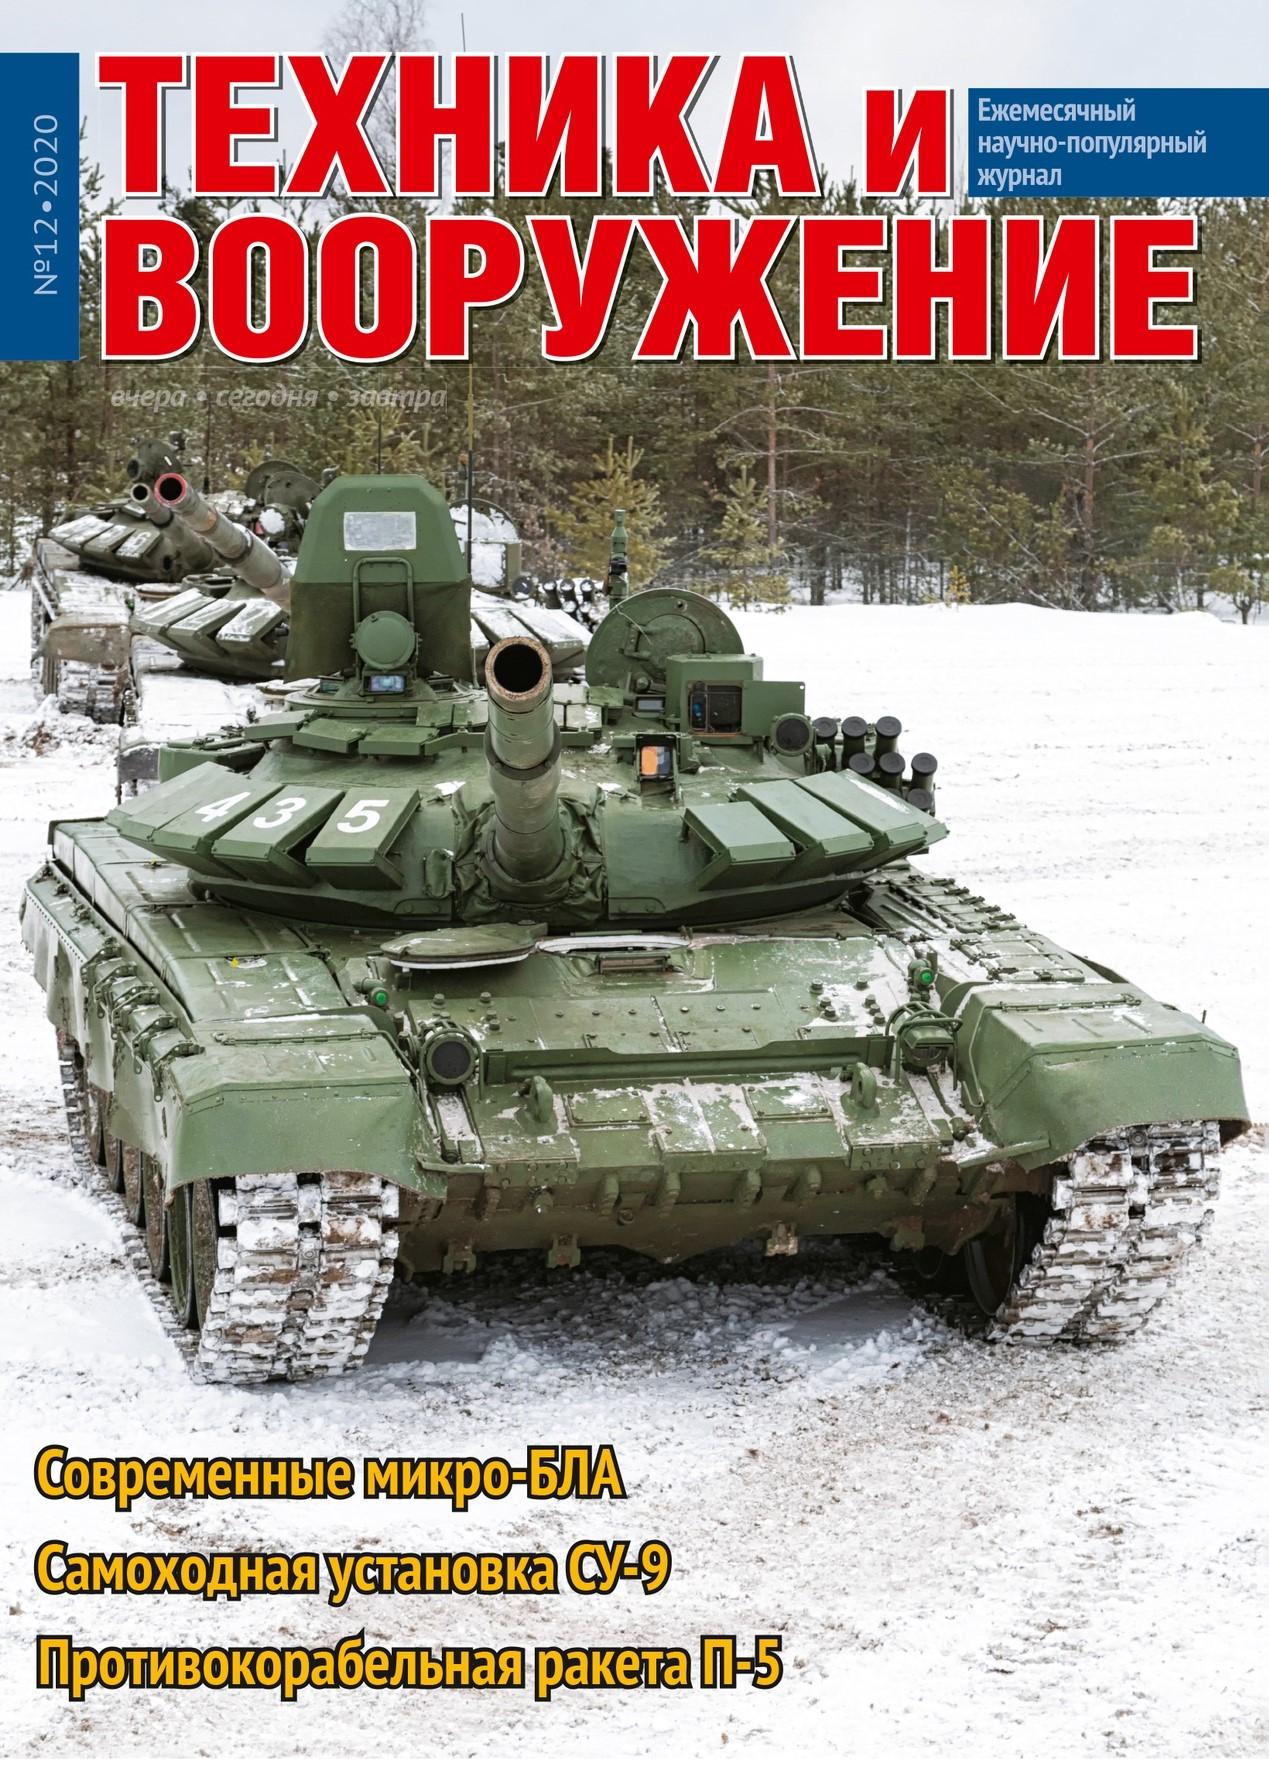 aXsipld1gE8